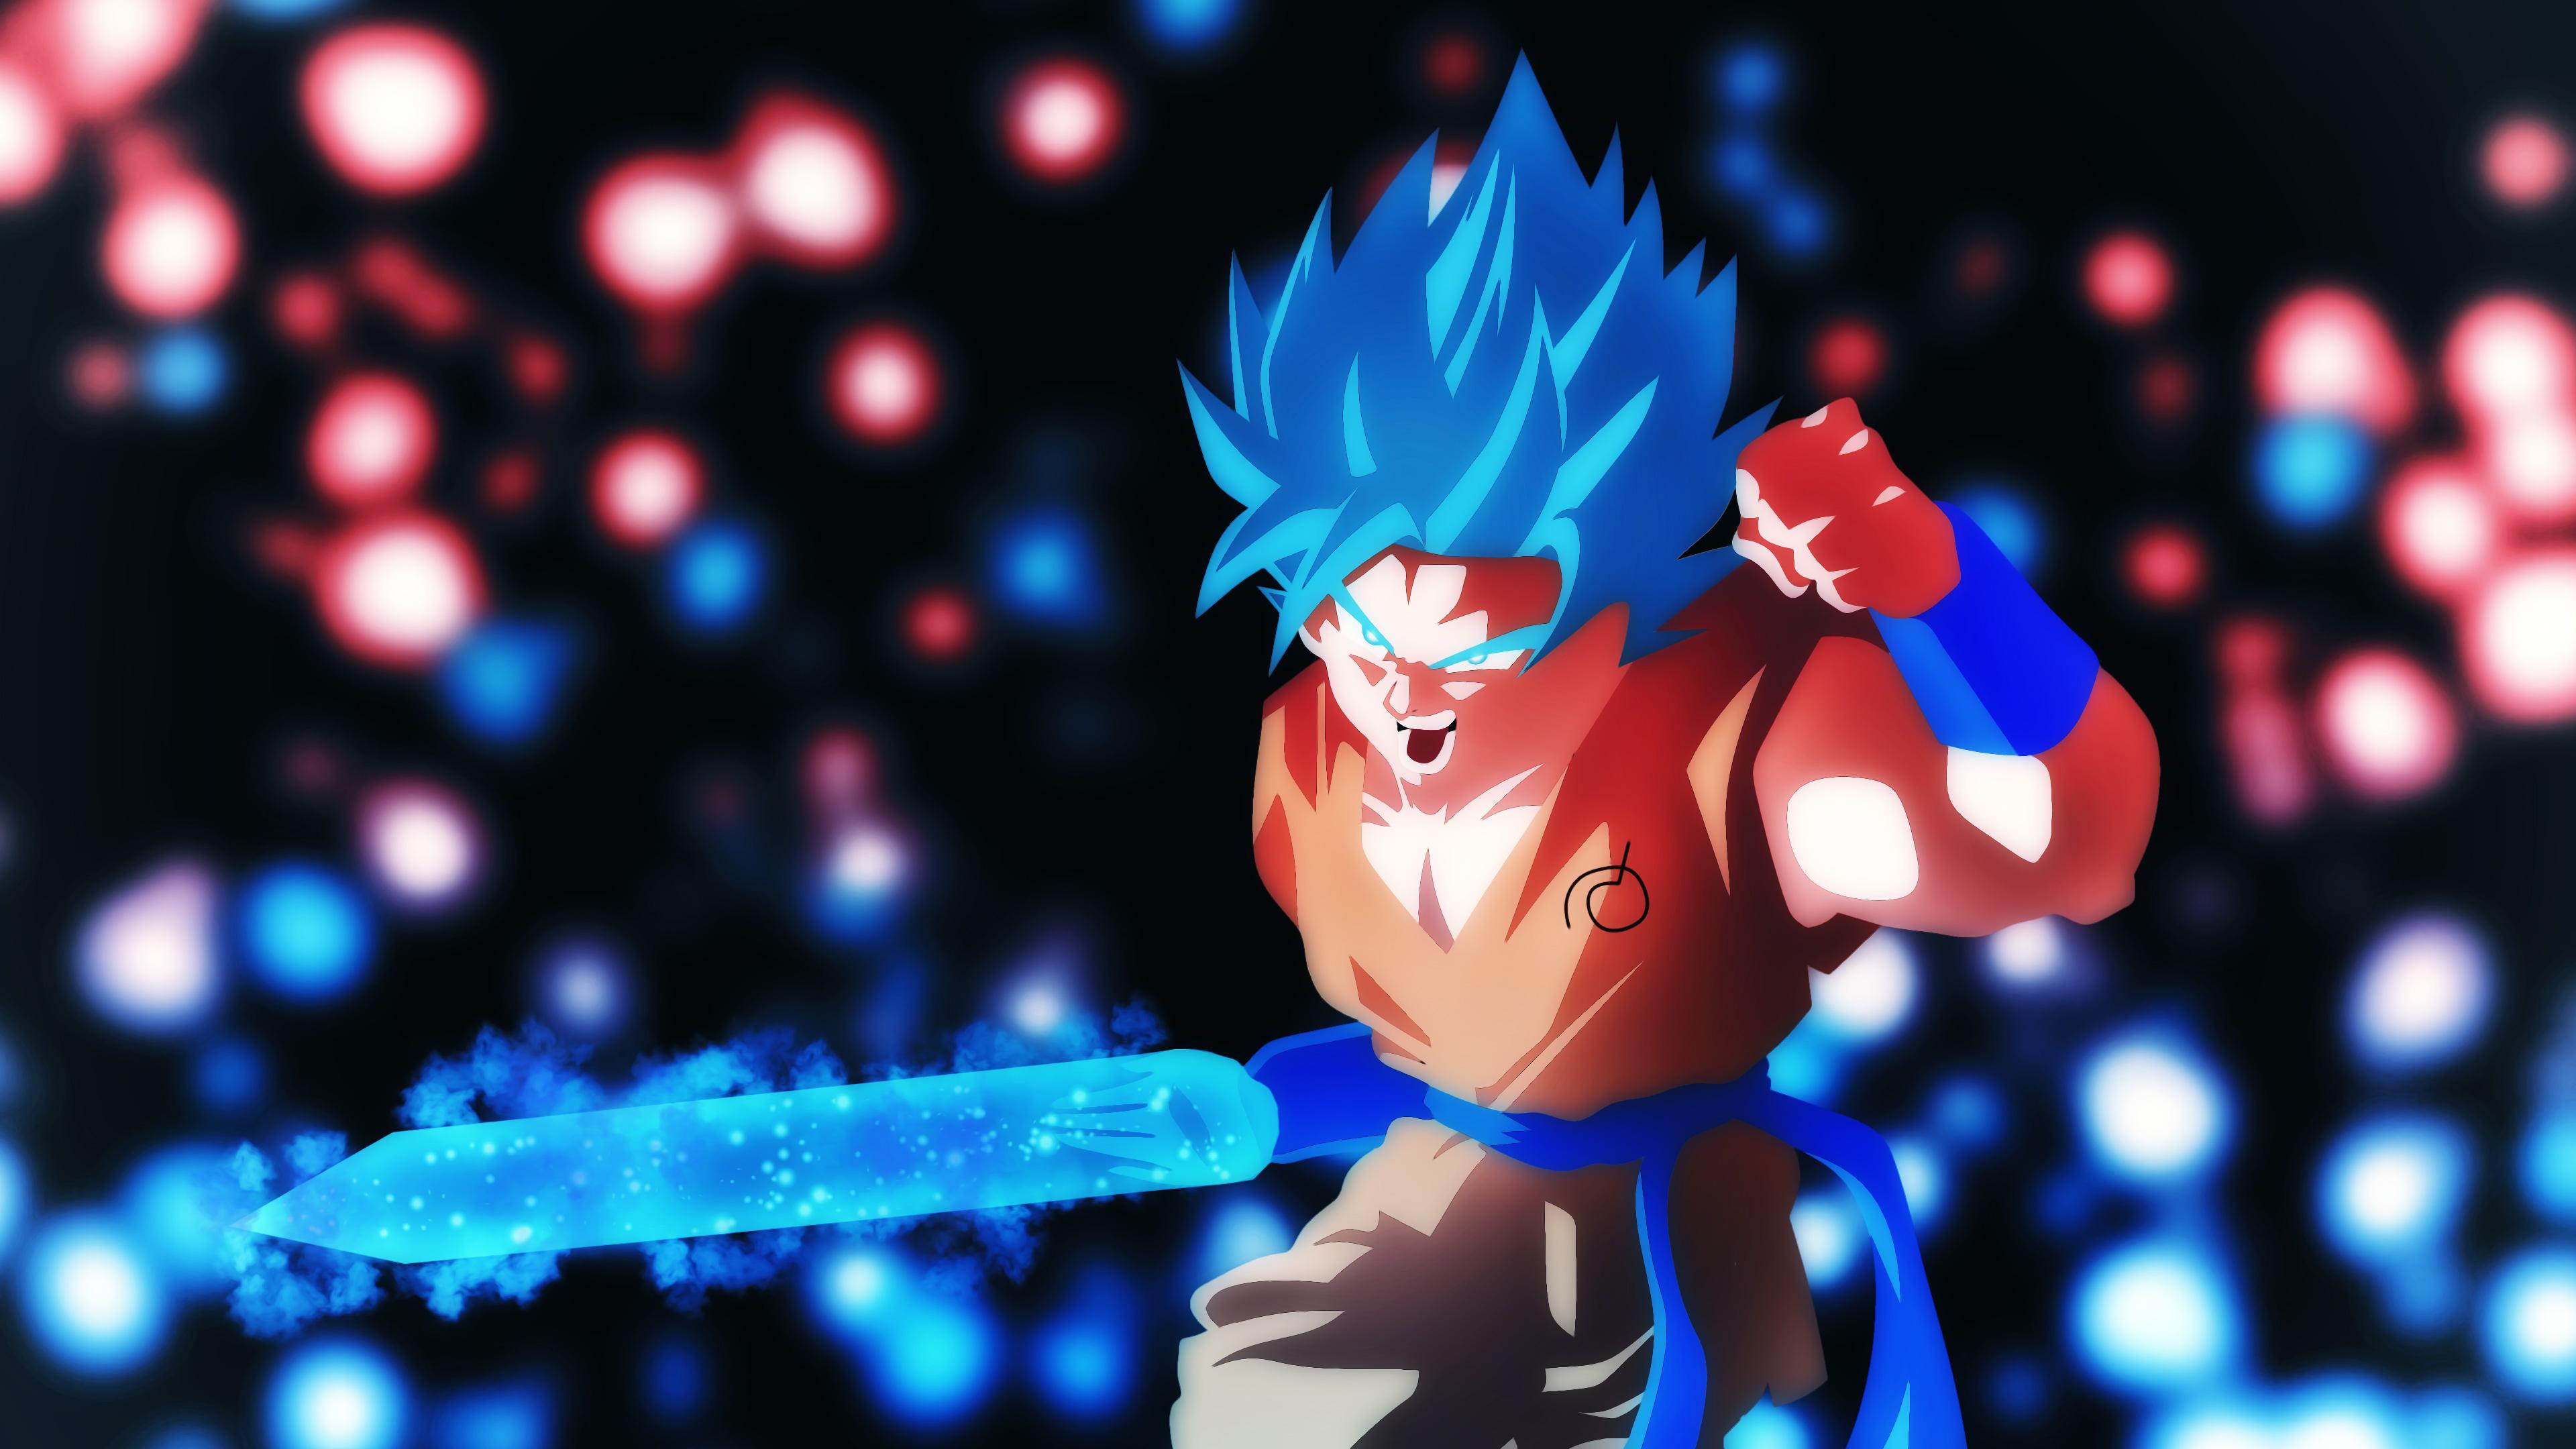 goku ssb ki blade 1541974213 - Goku SSB Ki Blade - hd-wallpapers, goku wallpapers, dragon ball wallpapers, dragon ball super wallpapers, deviantart wallpapers, artist wallpapers, anime wallpapers, 4k-wallpapers